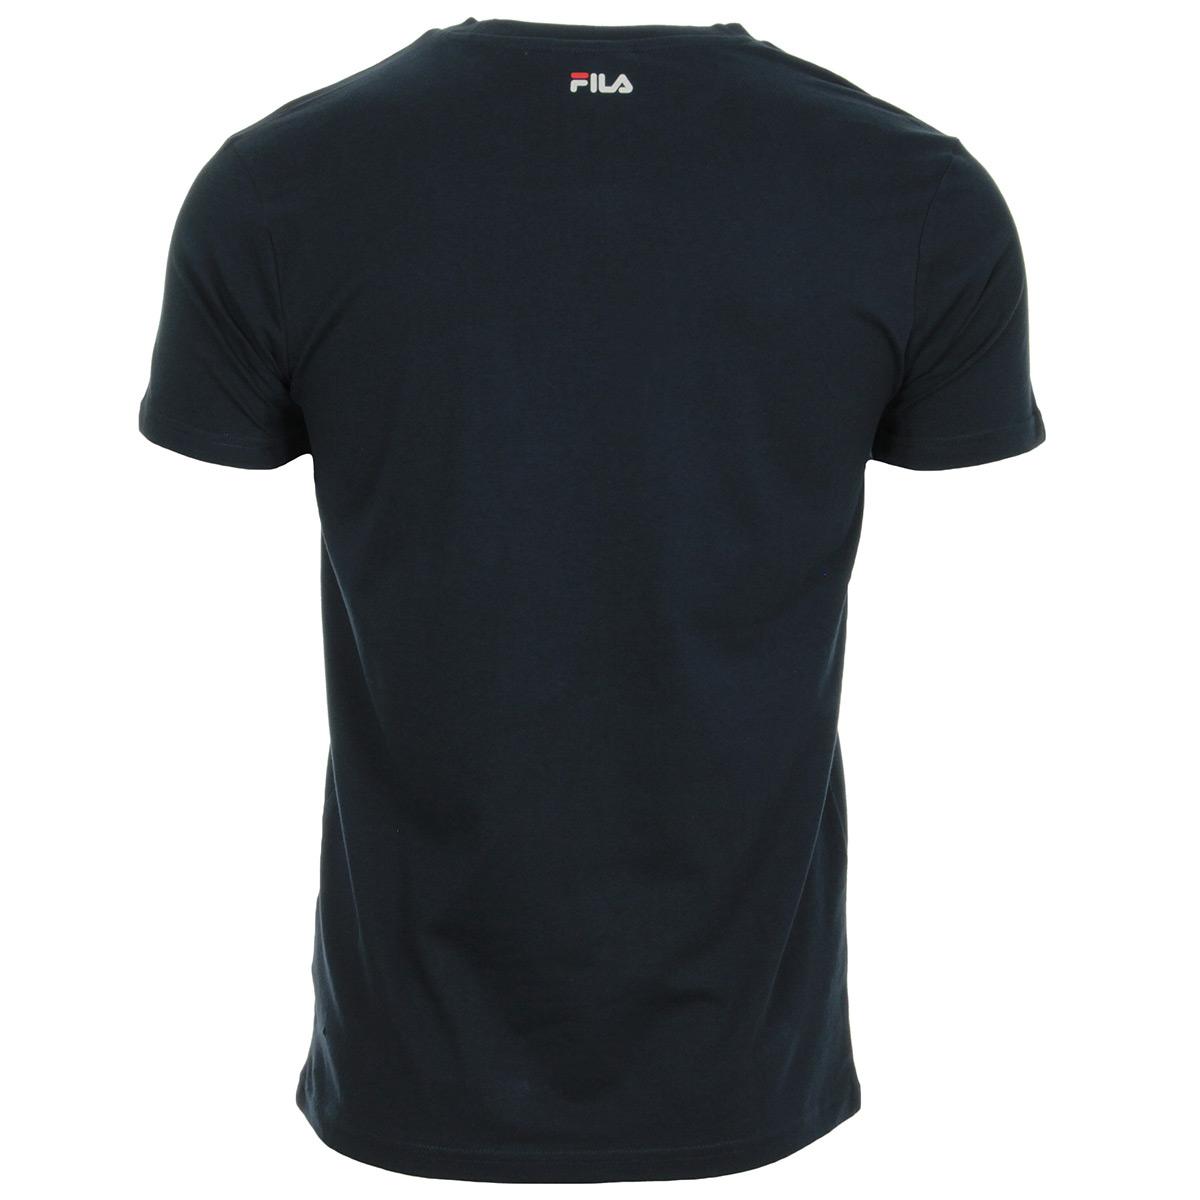 Fila Evan Tee SS 682157170, T-Shirts homme